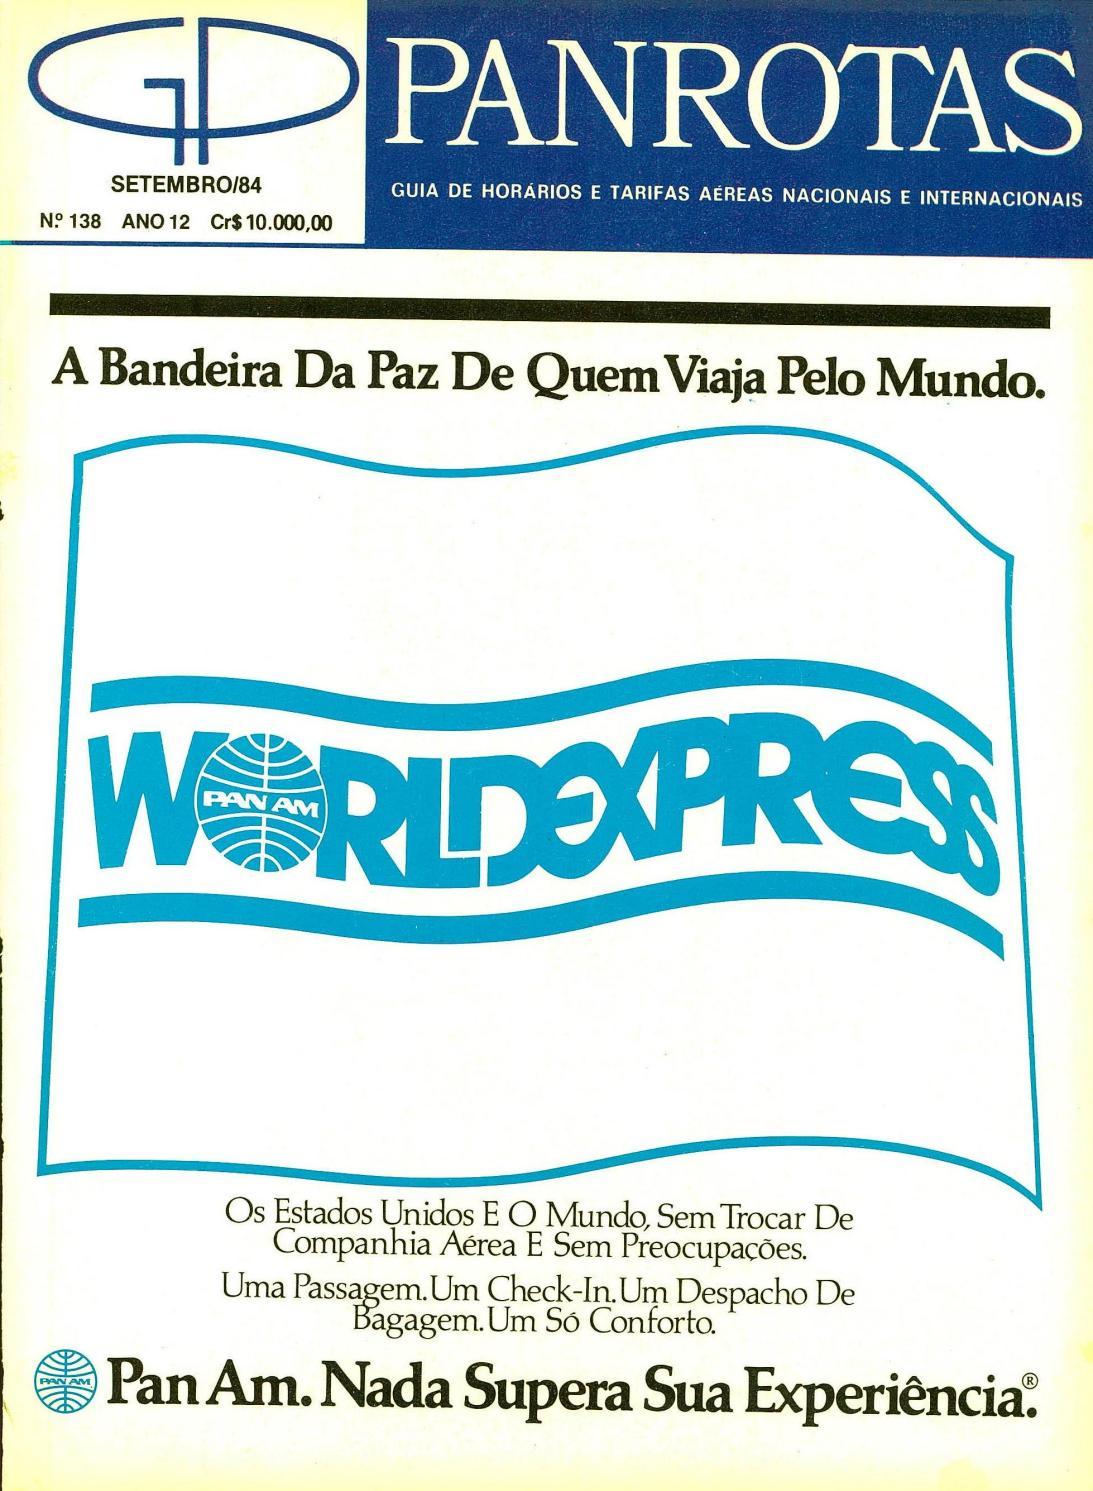 b5d2ec284d Guia PANROTAS - Edição 138 - Setembro 1984 by PANROTAS Editora - issuu